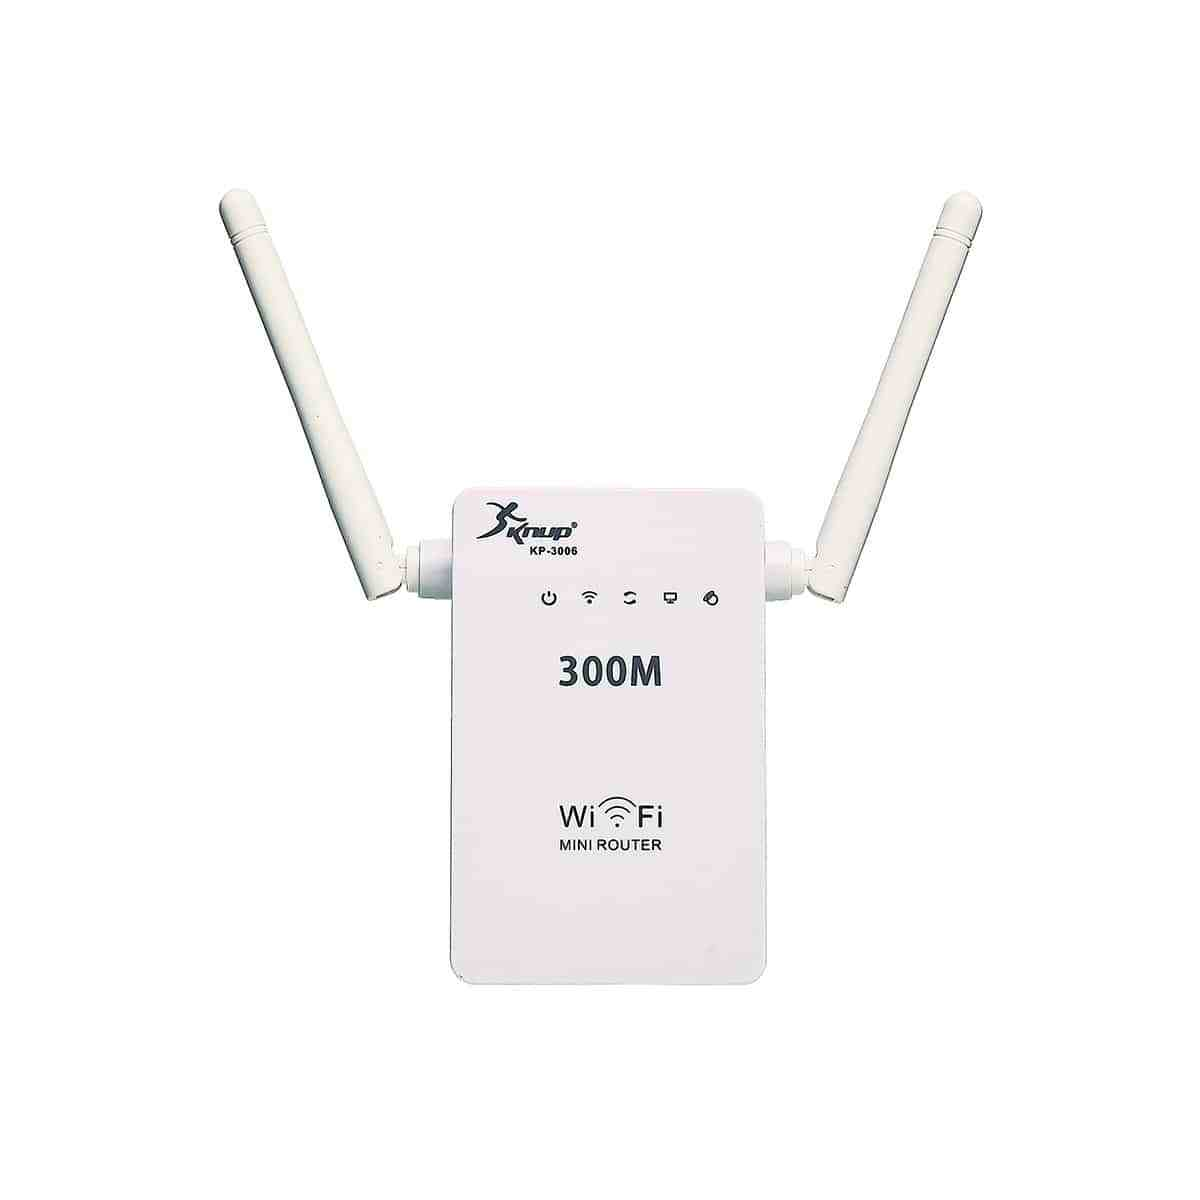 Repetidor Wifi Extensor 2 Antenas 300mbps Knup KP-3006